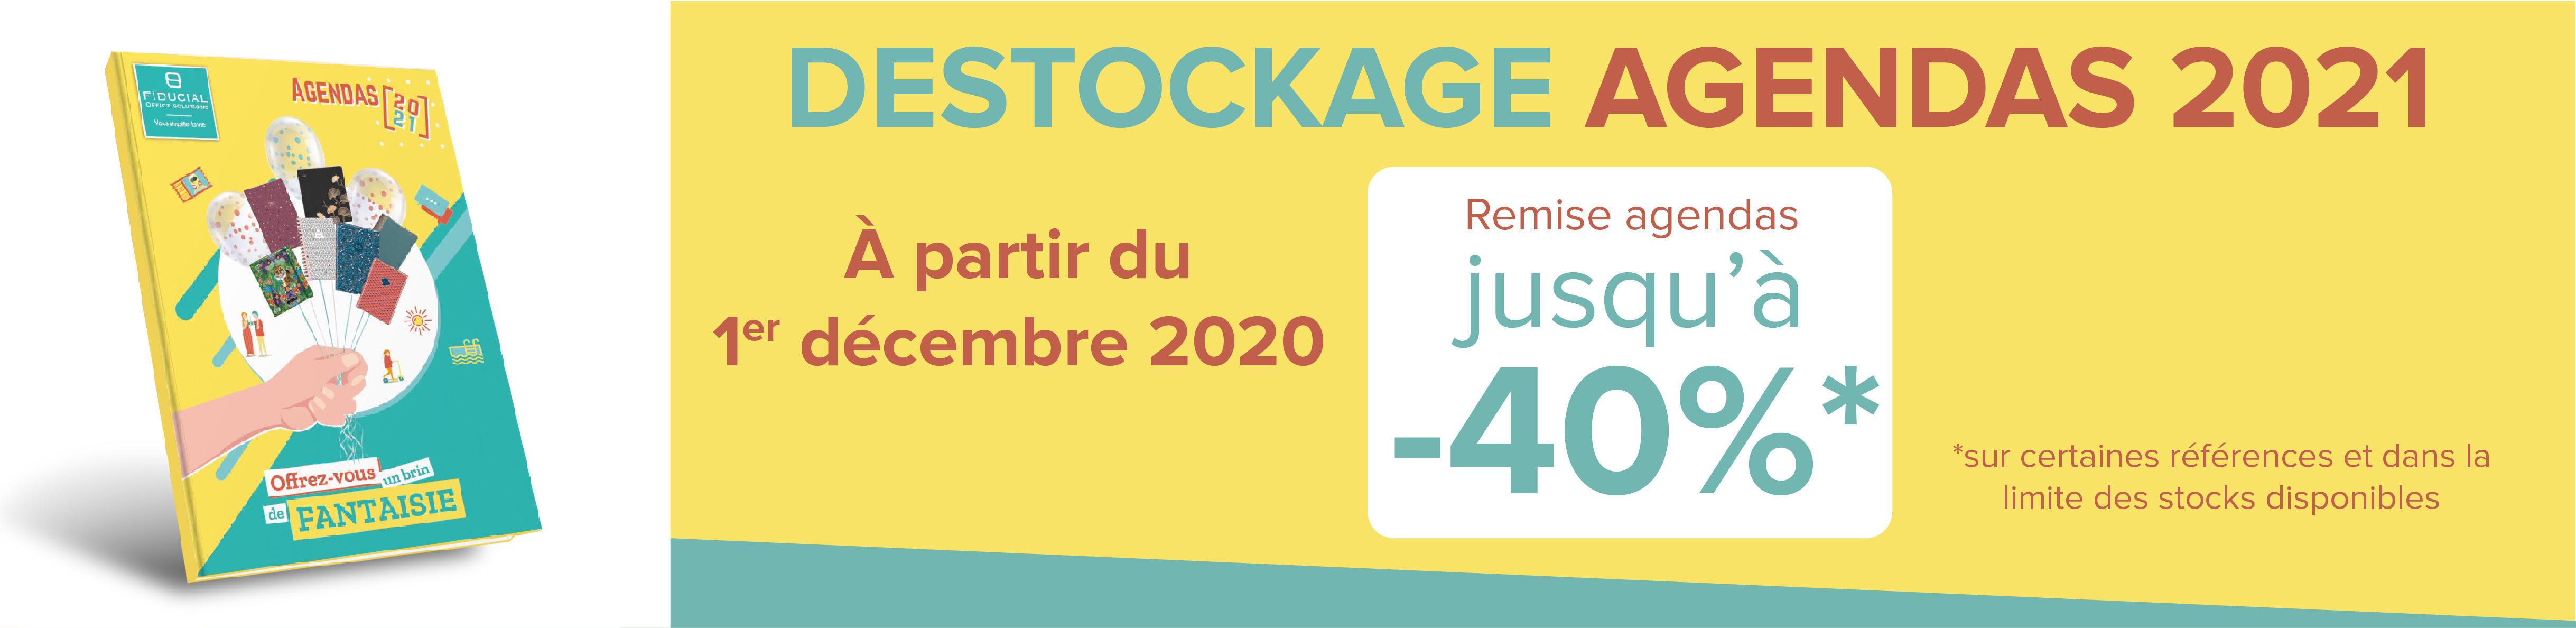 12-2020-Destockage-Agendas